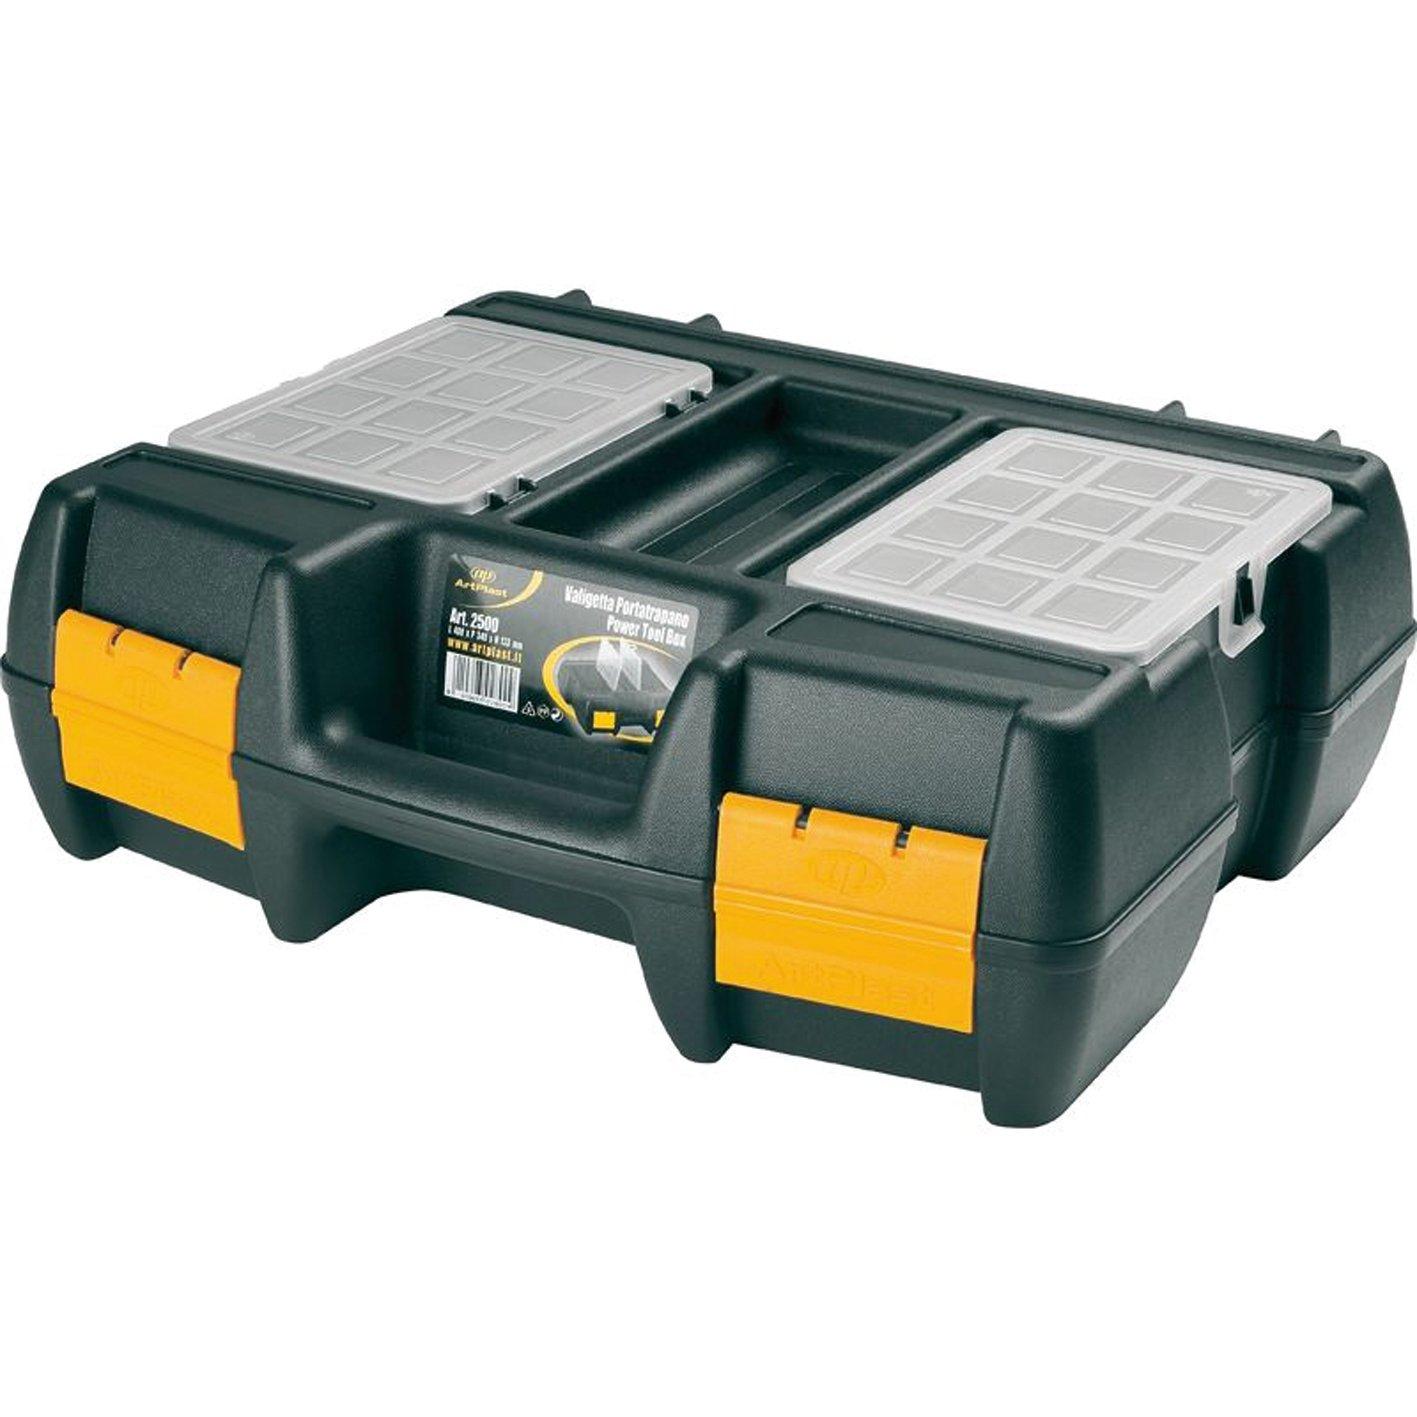 Art Plast SRL 2500 - Caja de herramientas, 40X34X13 product image